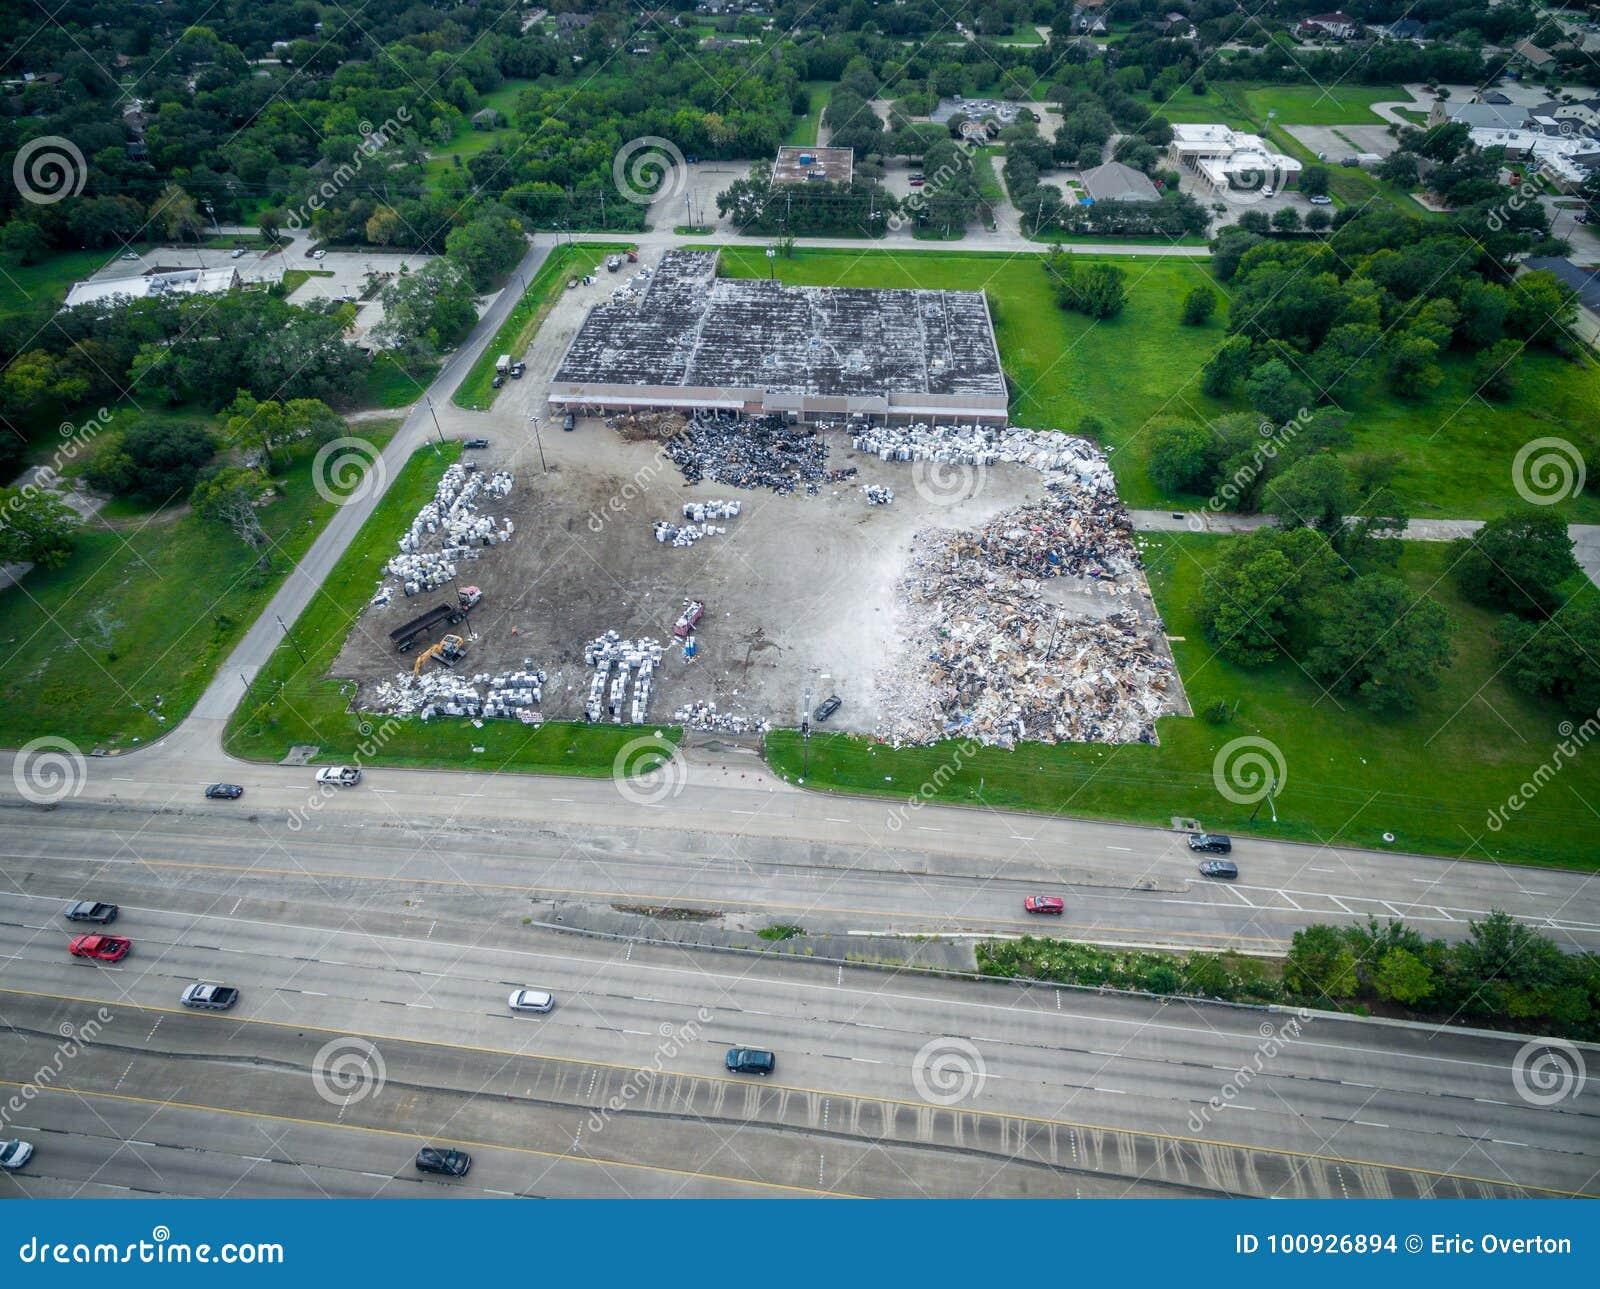 Trash and debris outside of Houston homes